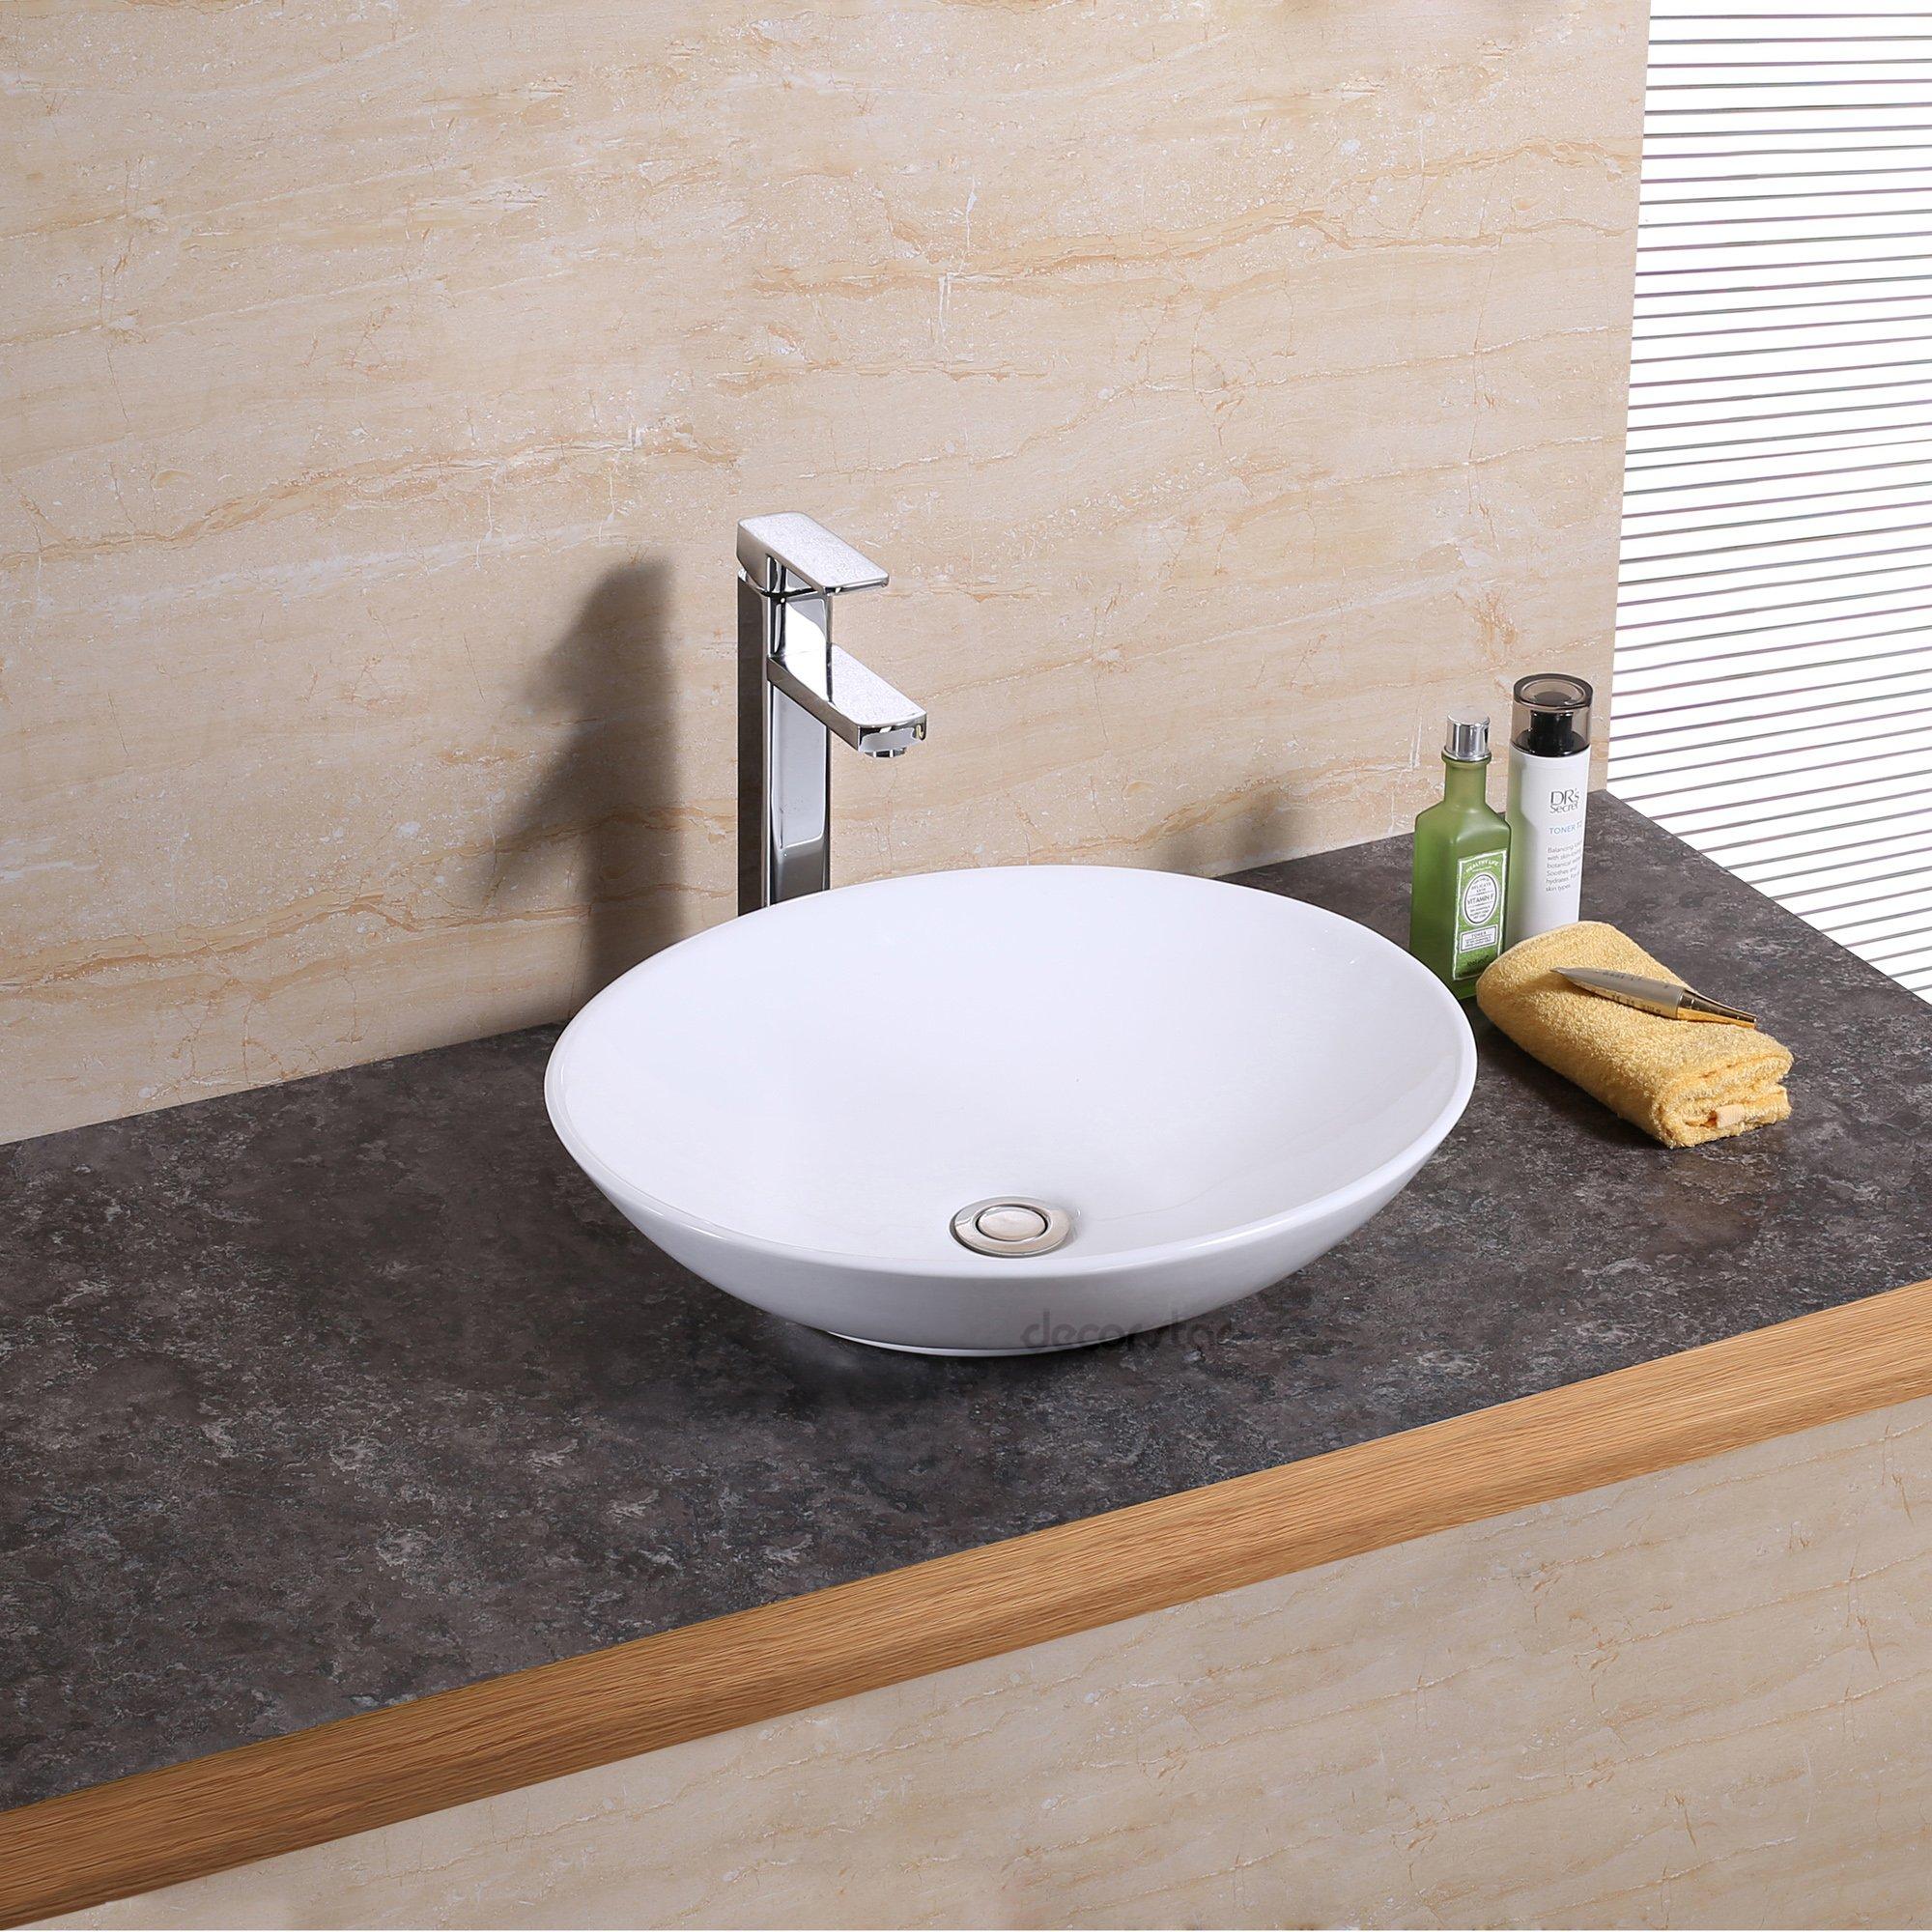 Decor Star CB-023 Bathroom Porcelain Ceramic Vessel Vanity Sink Art Basin